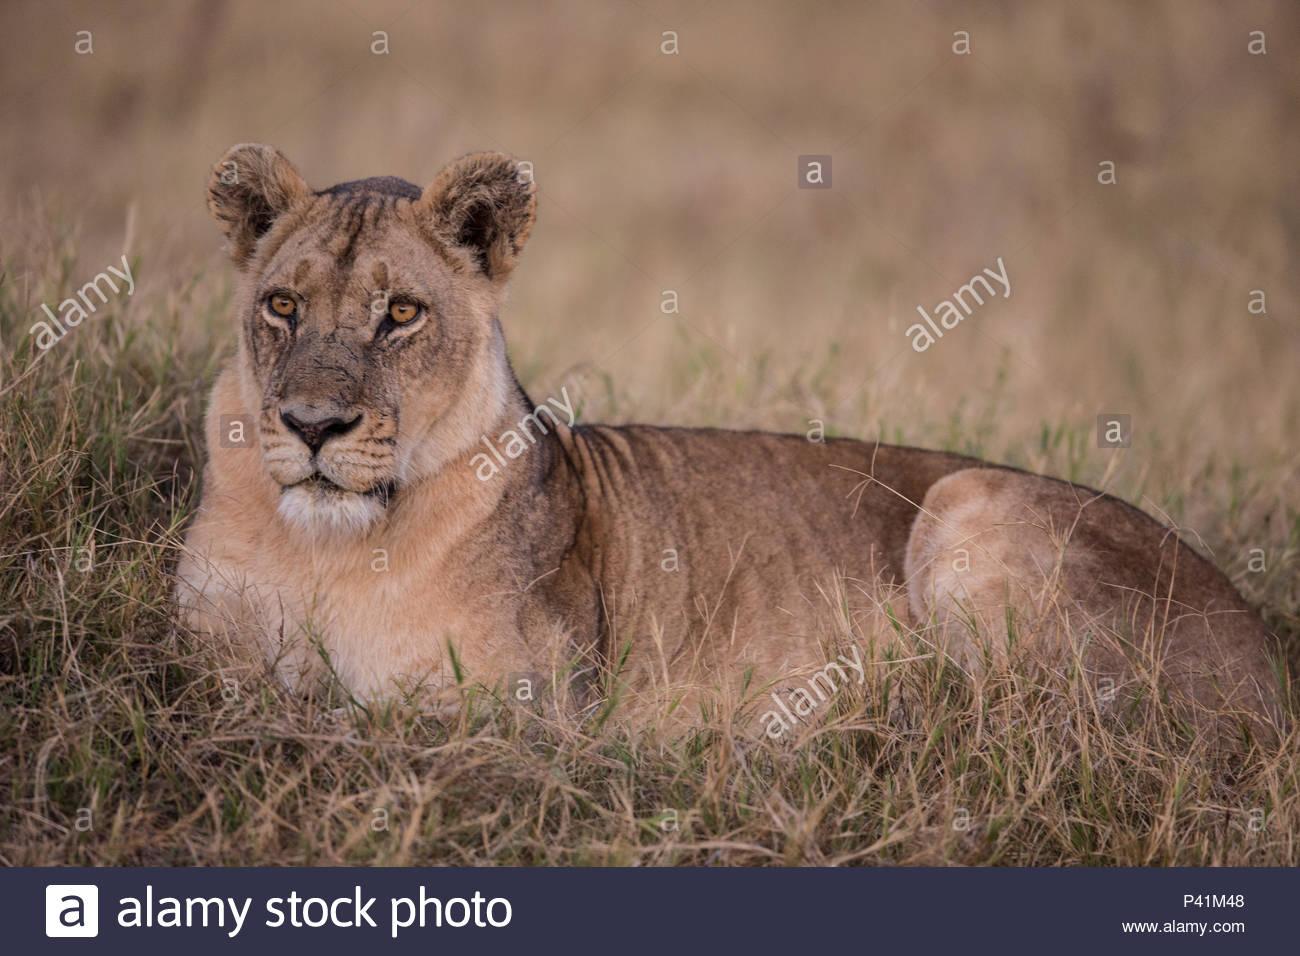 A female lion on Chief's Island in Botswana's Okavango Delta. - Stock Image